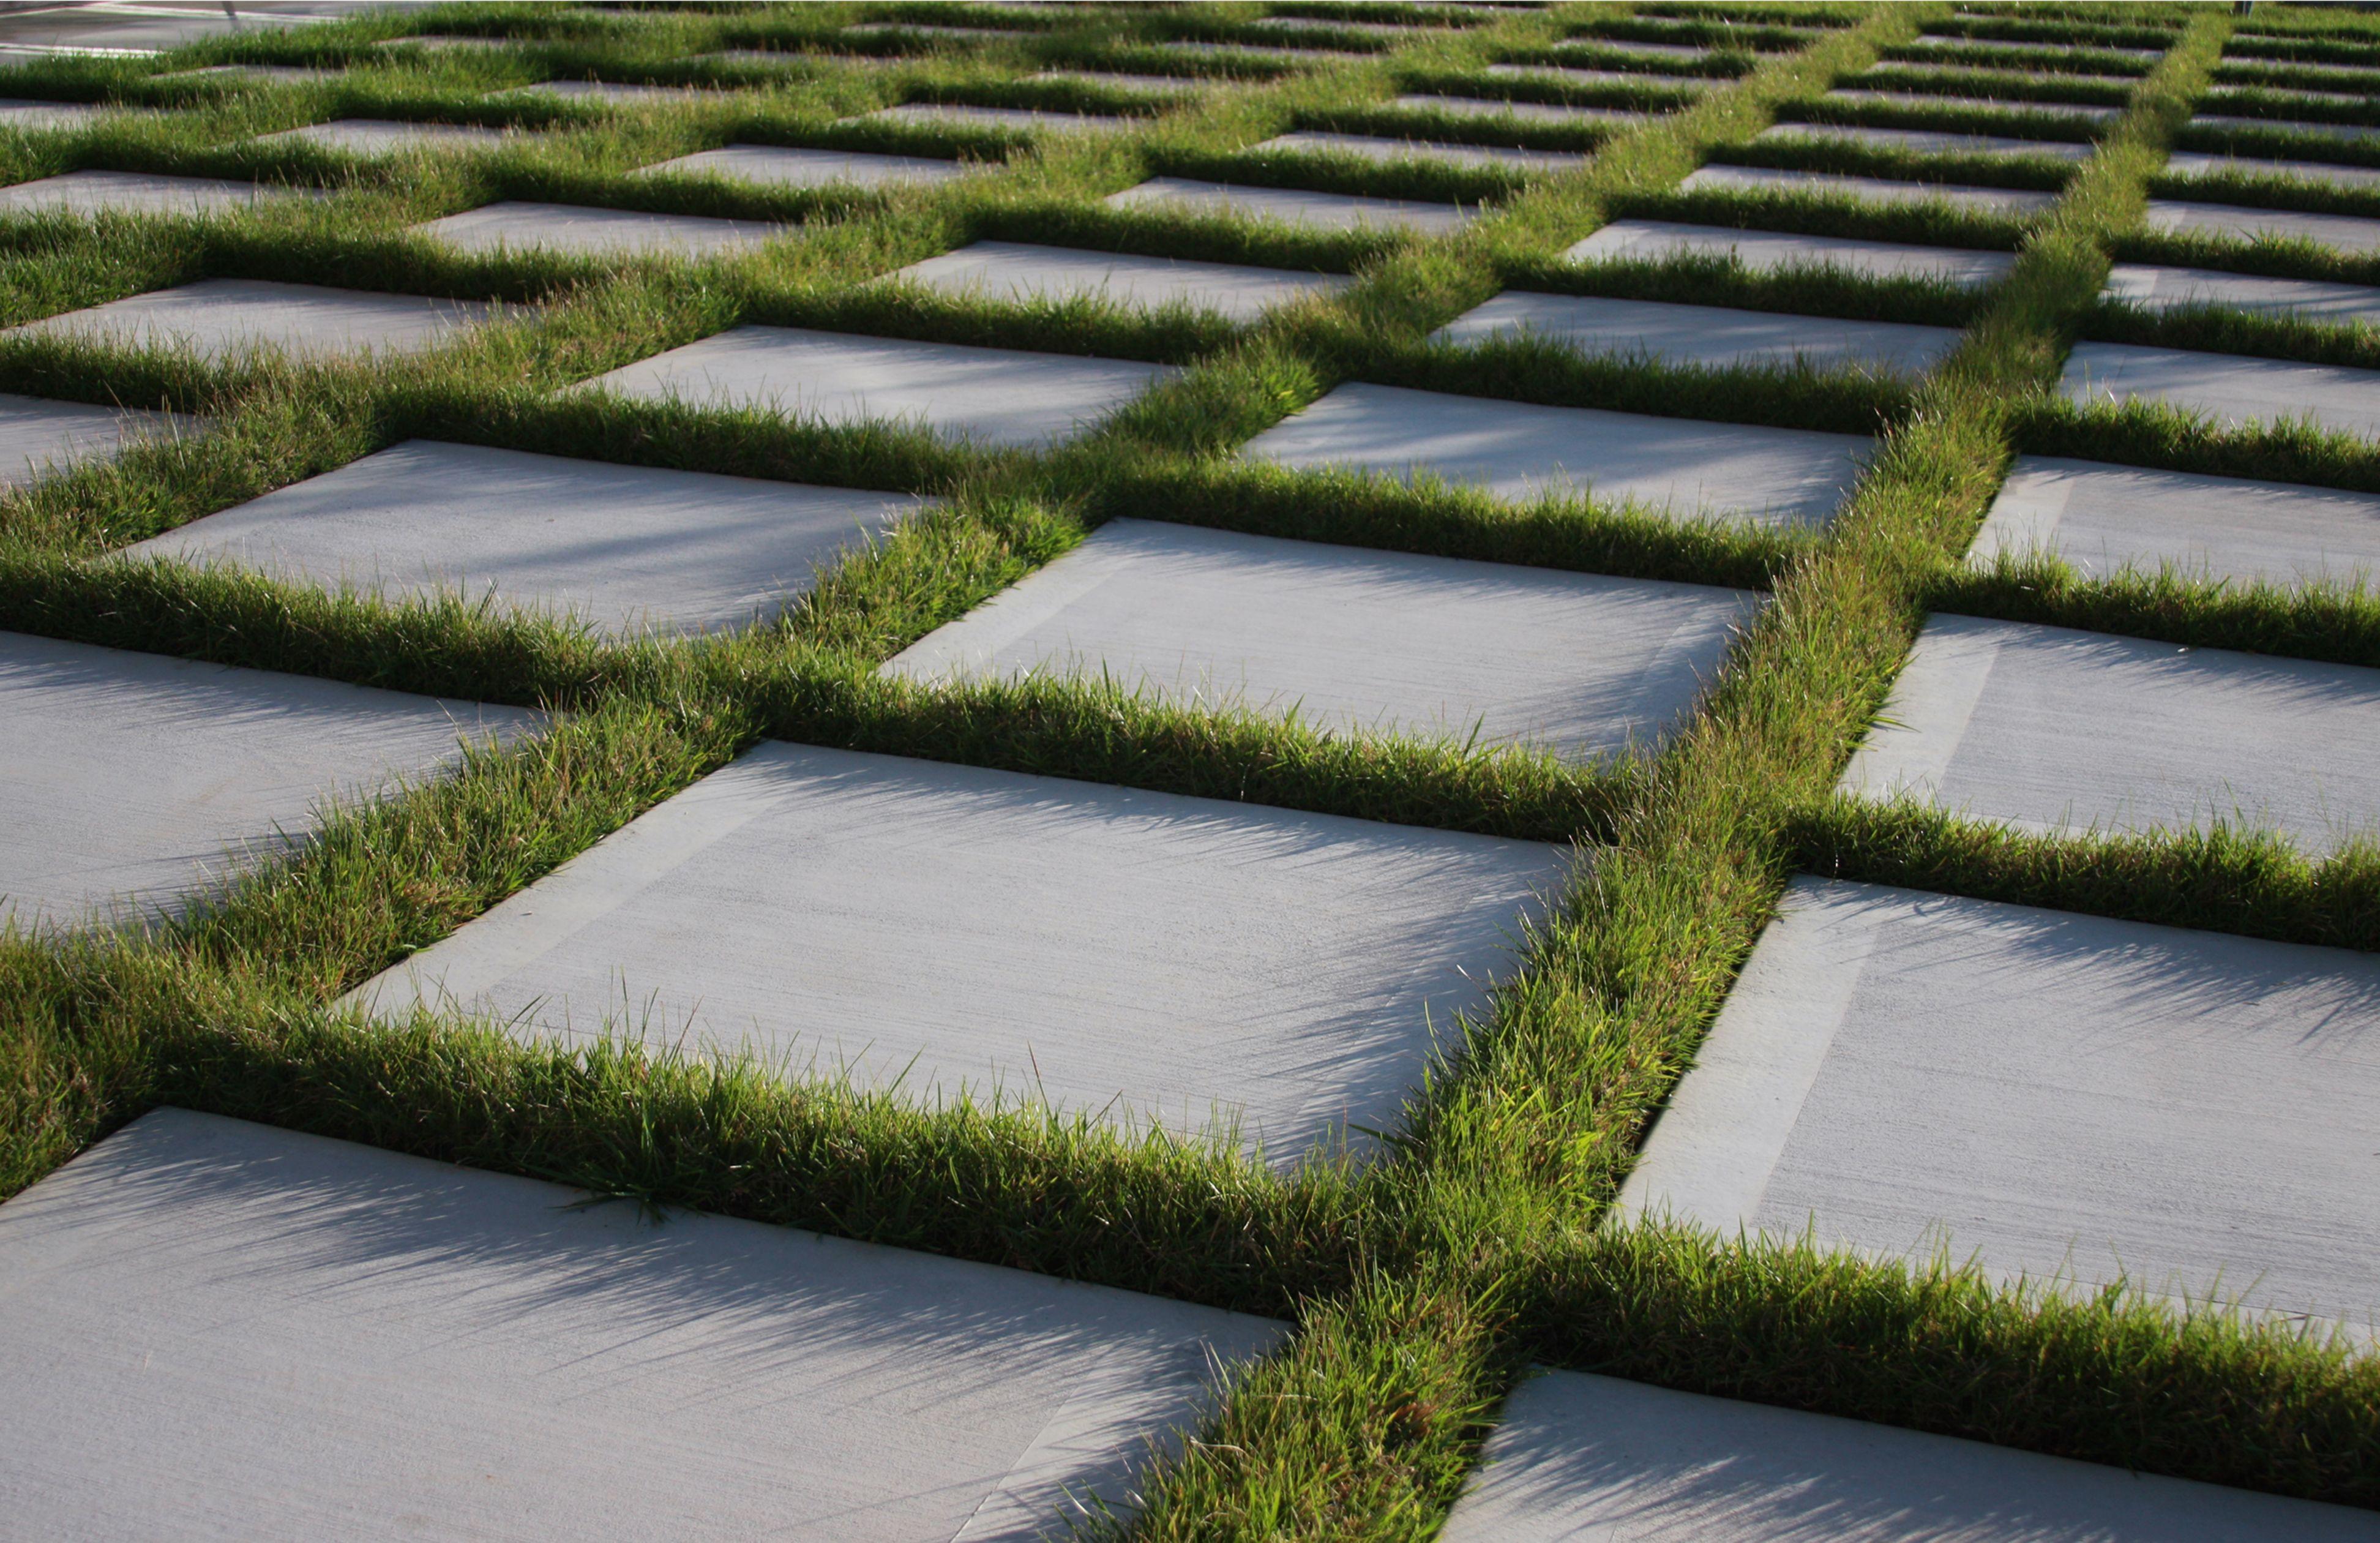 grass + pavers patio/ Use artificial turf?? | Friedman ...